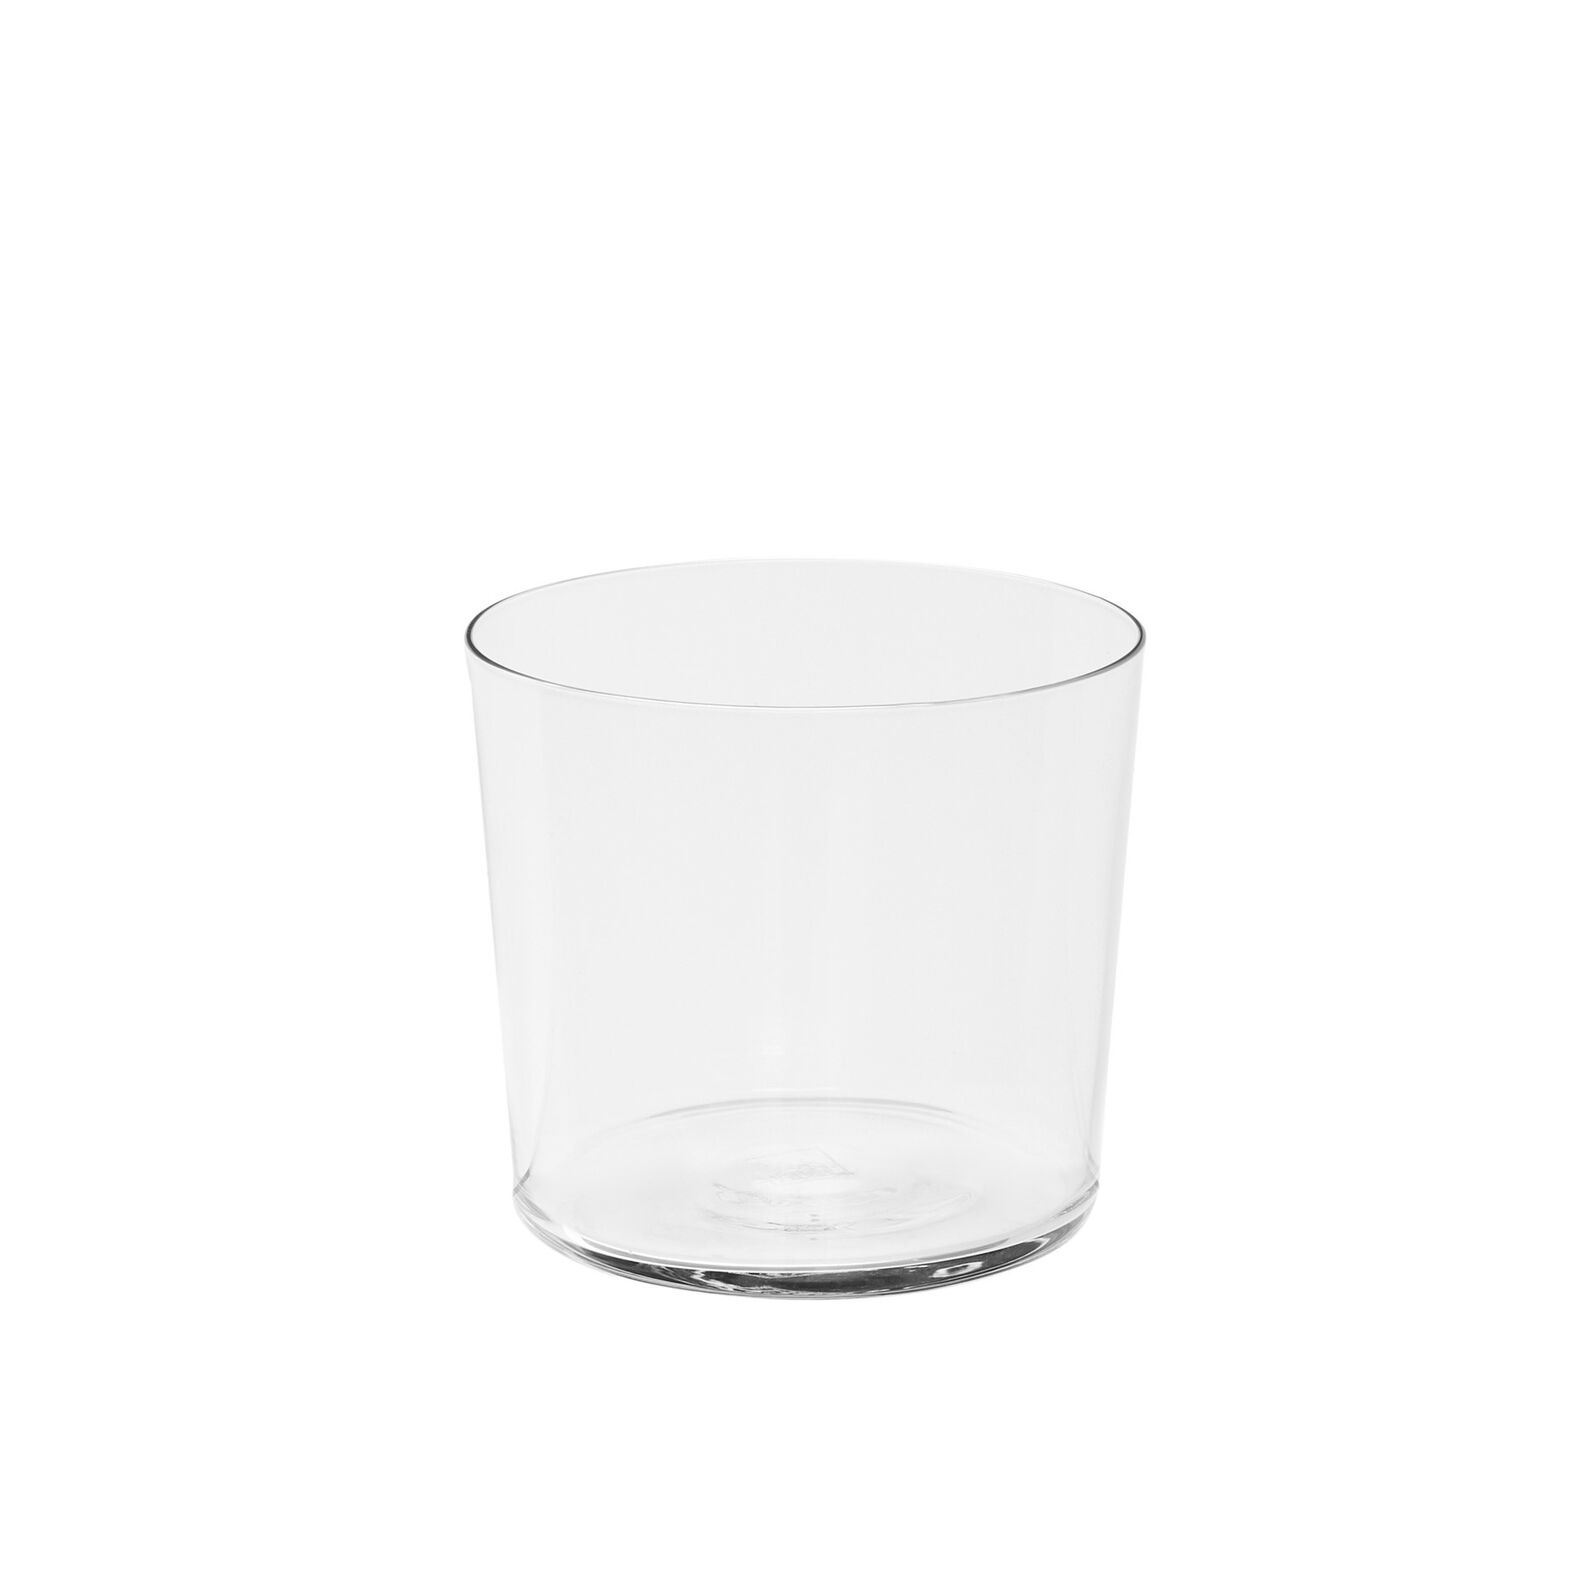 Set of 6 Starck wine glasses